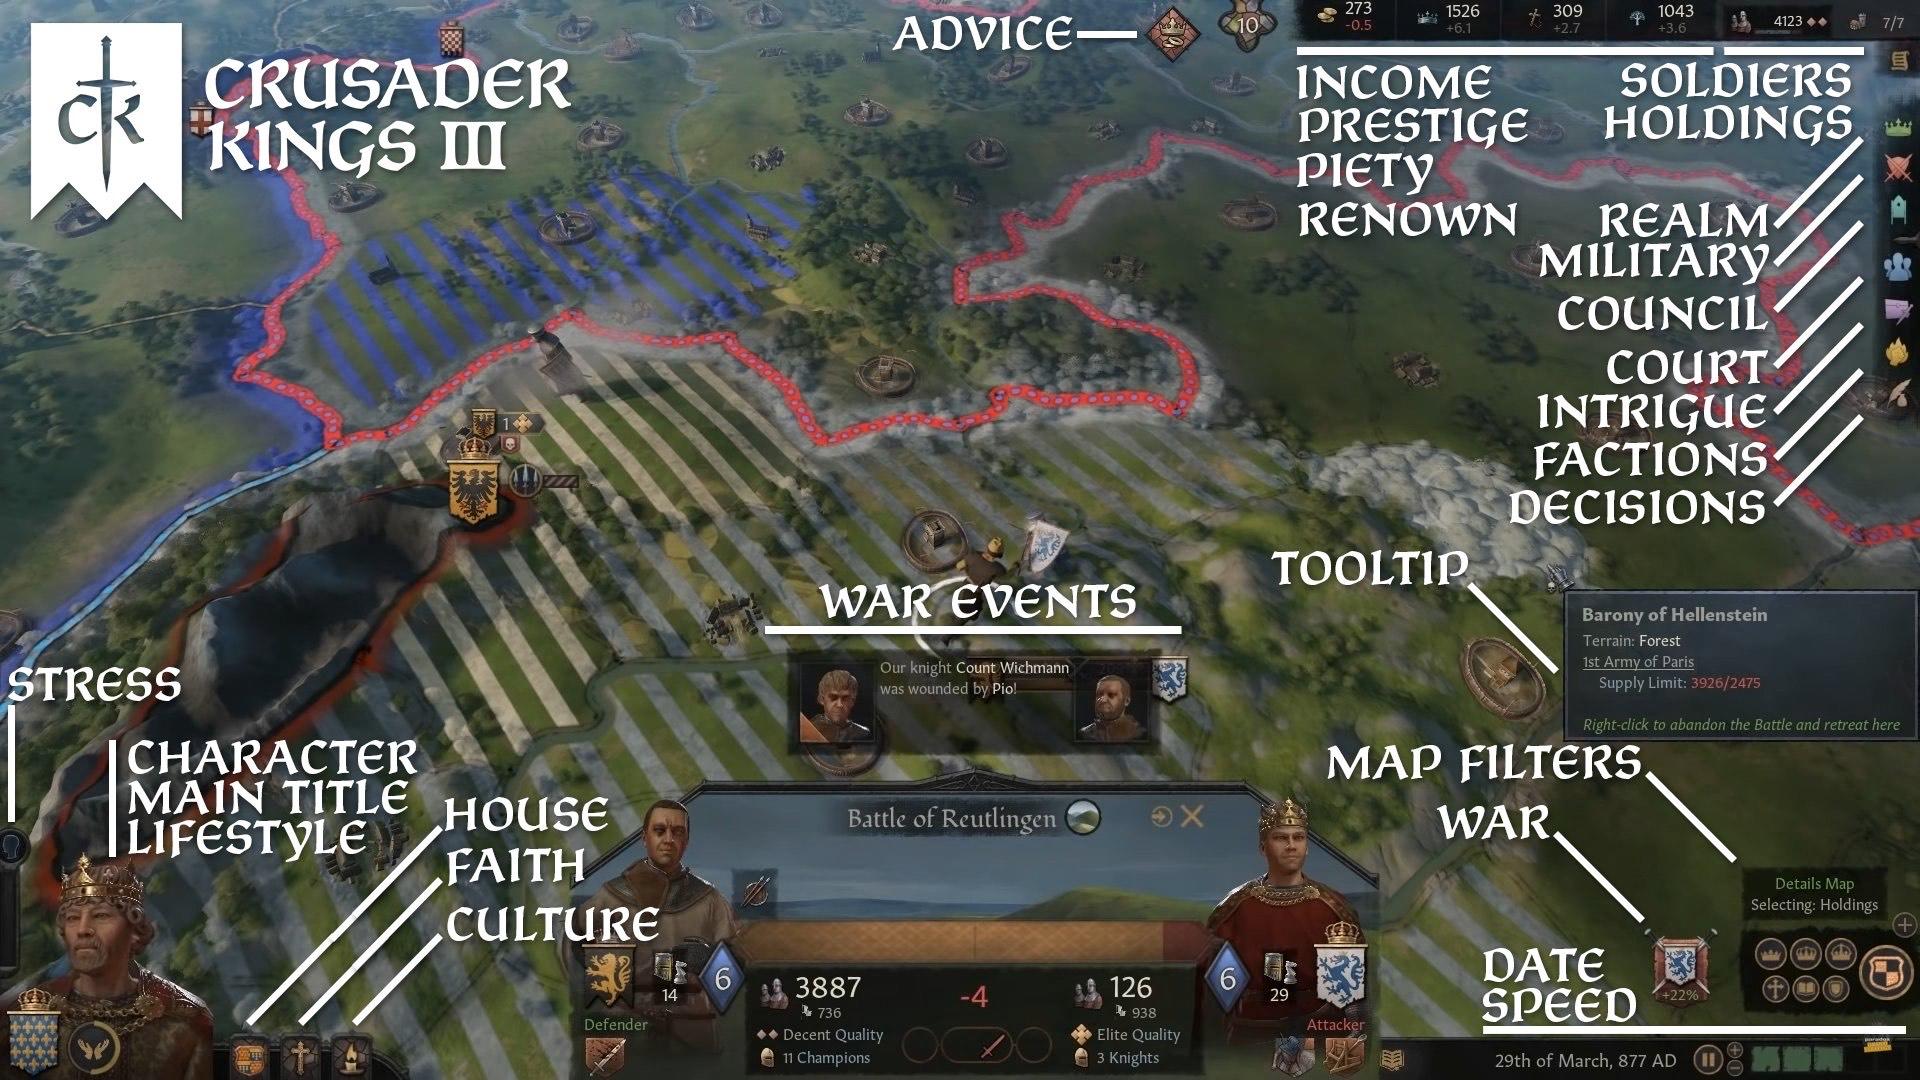 Crusader Kings 3 Interface Diagram